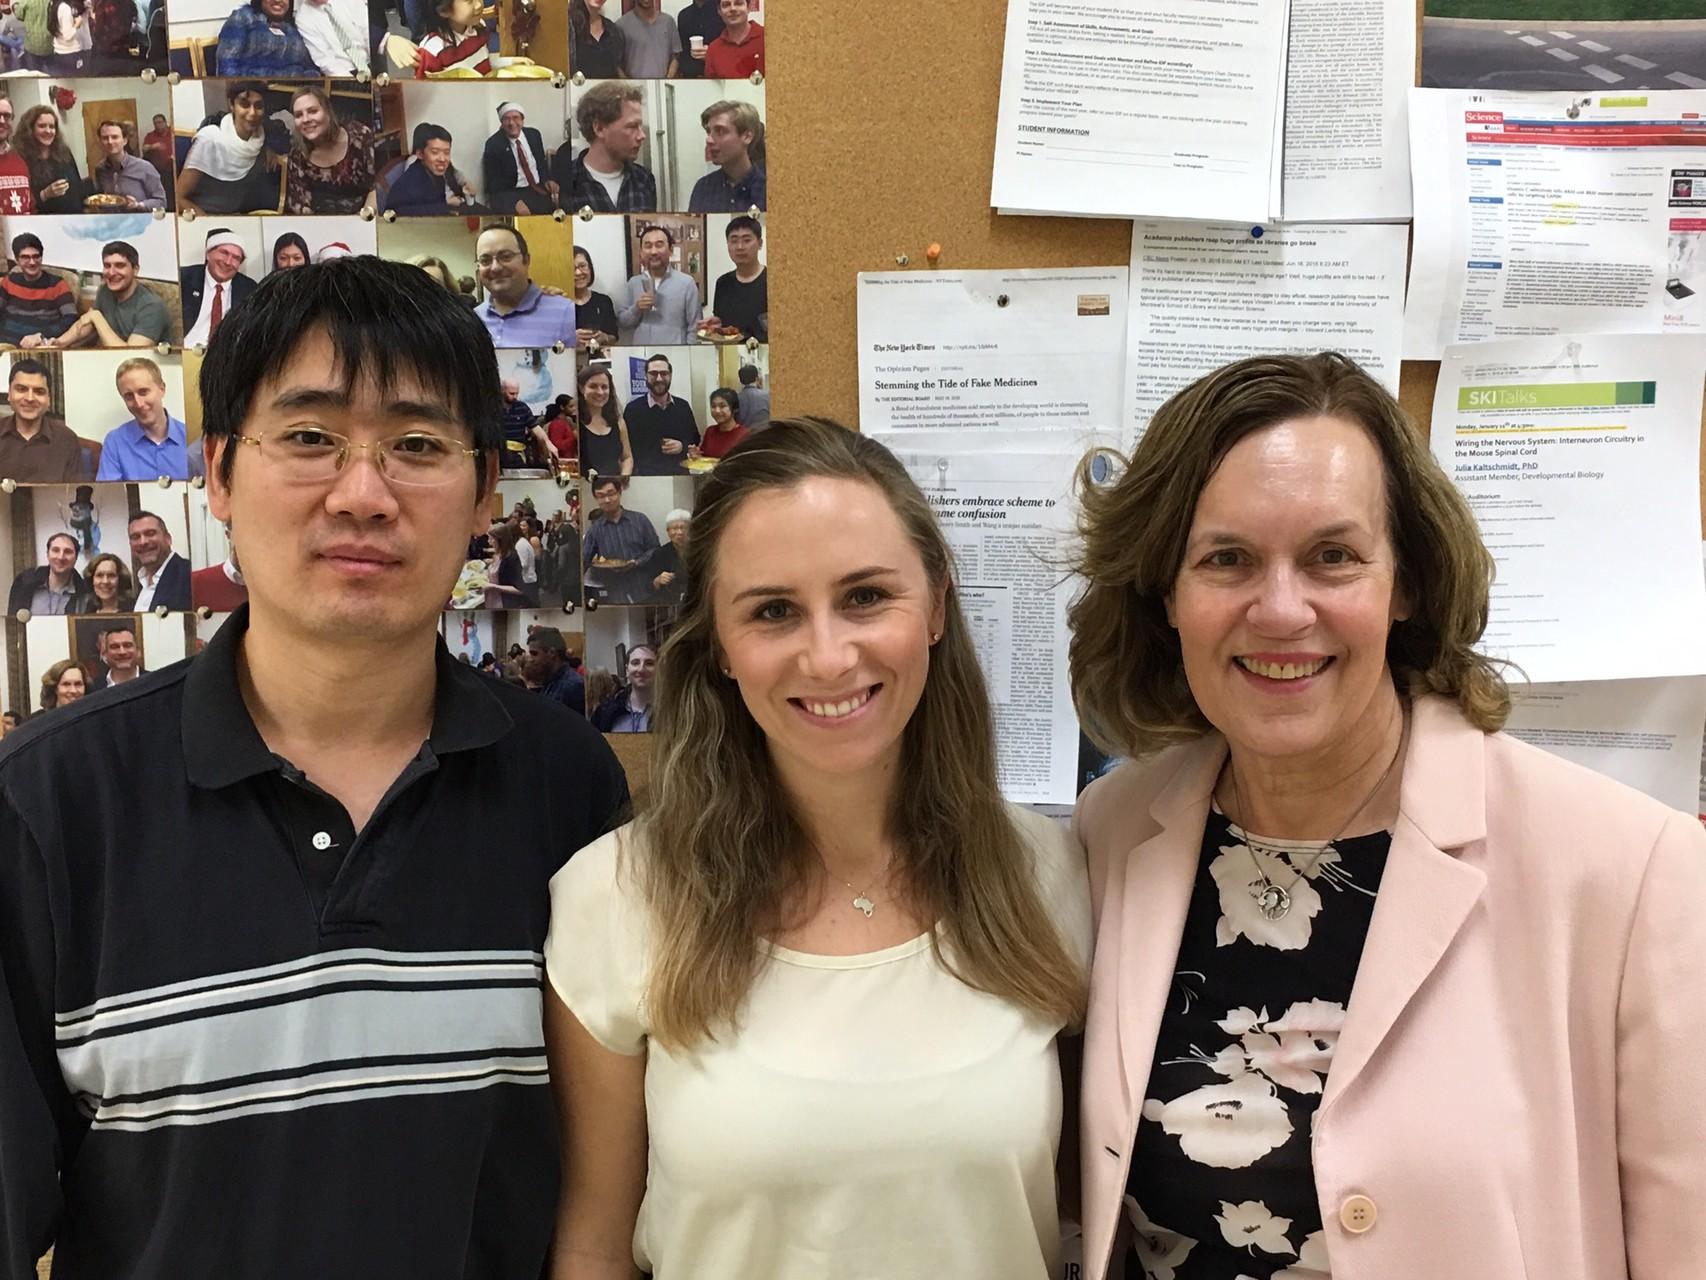 Drs. Leiping Fu, Denise Minton, & Lorraine Gudas Feb. 2016 celebrating the Clin. Cancer Res. NDUFA4L2 publication!